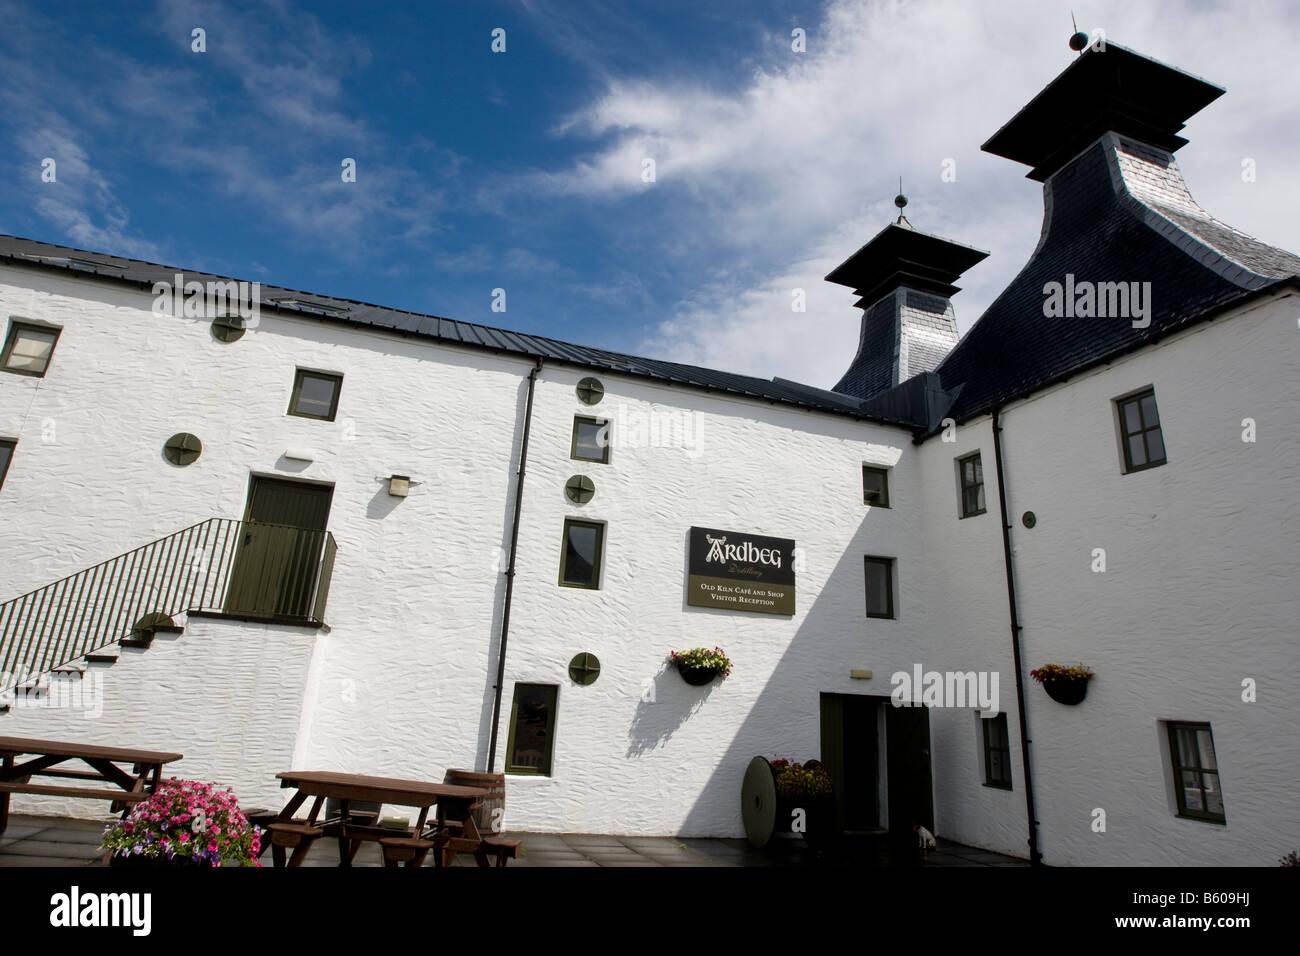 Ardbeg malt whisky distillery, Islay, Scotland - Stock Image